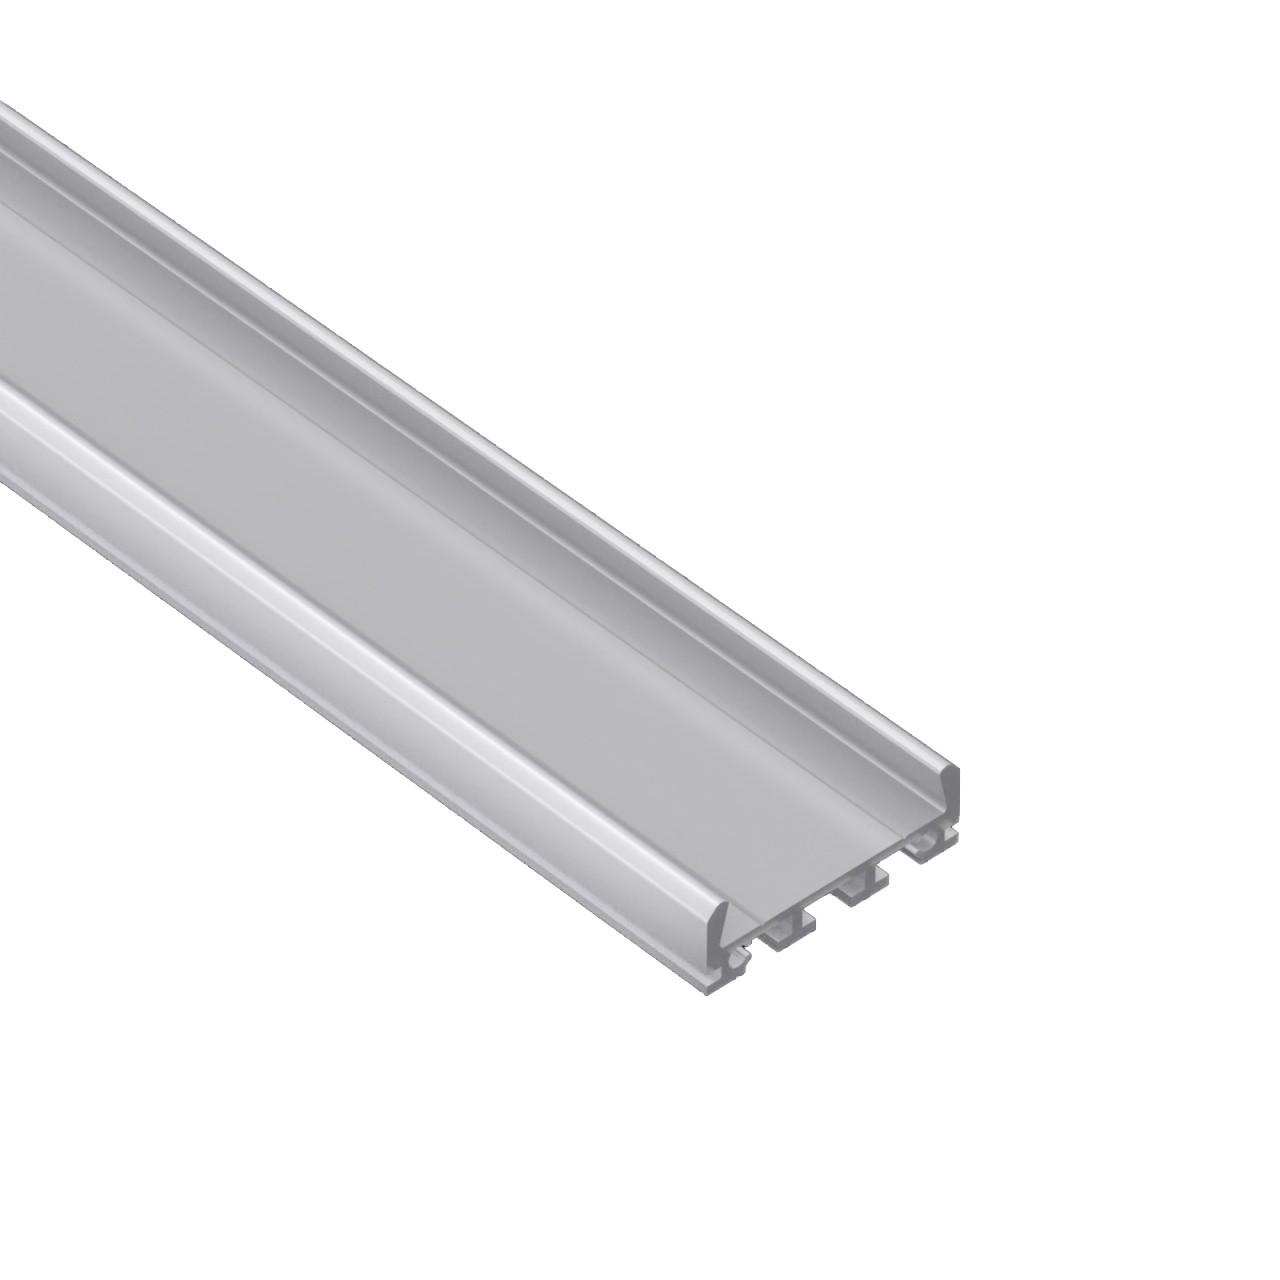 AT9 Pendant Led Aluminum Profile